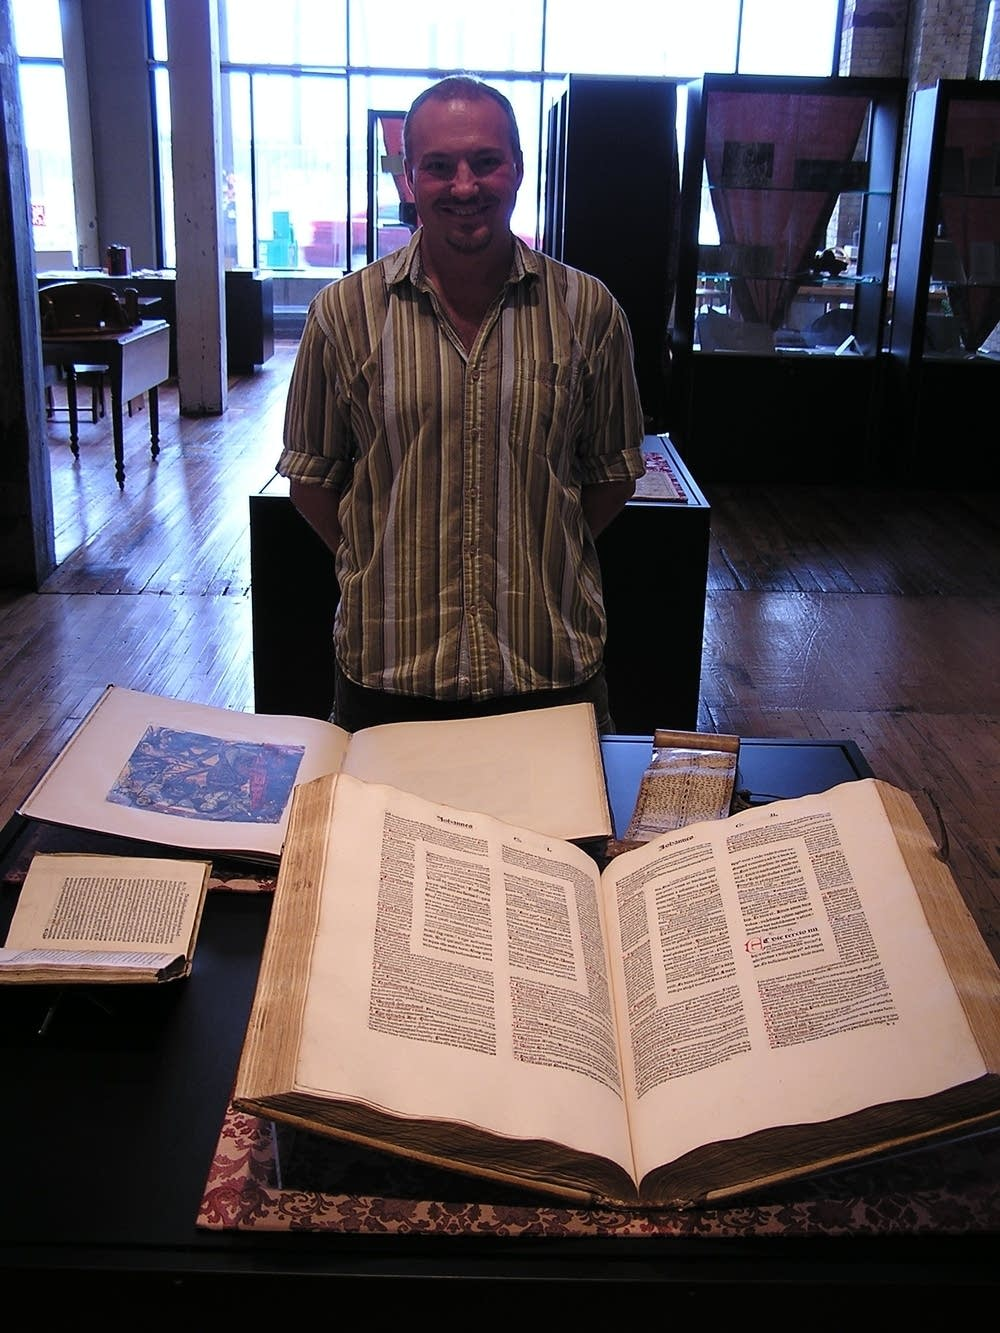 15th-century Bible